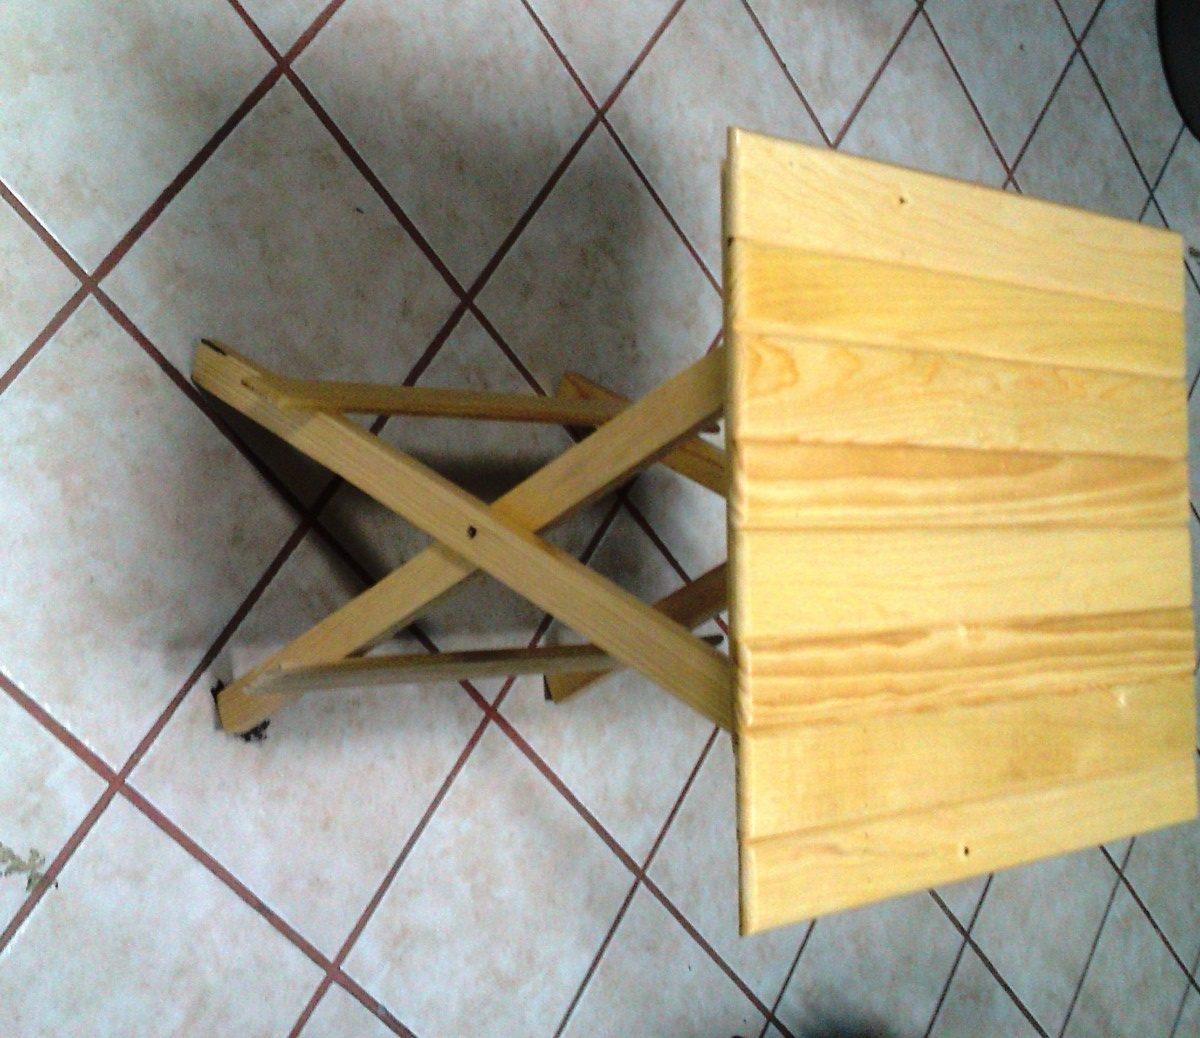 Mesa de madera plegable portatil jardin o terraza 299 - Mesas de madera plegables para exterior ...